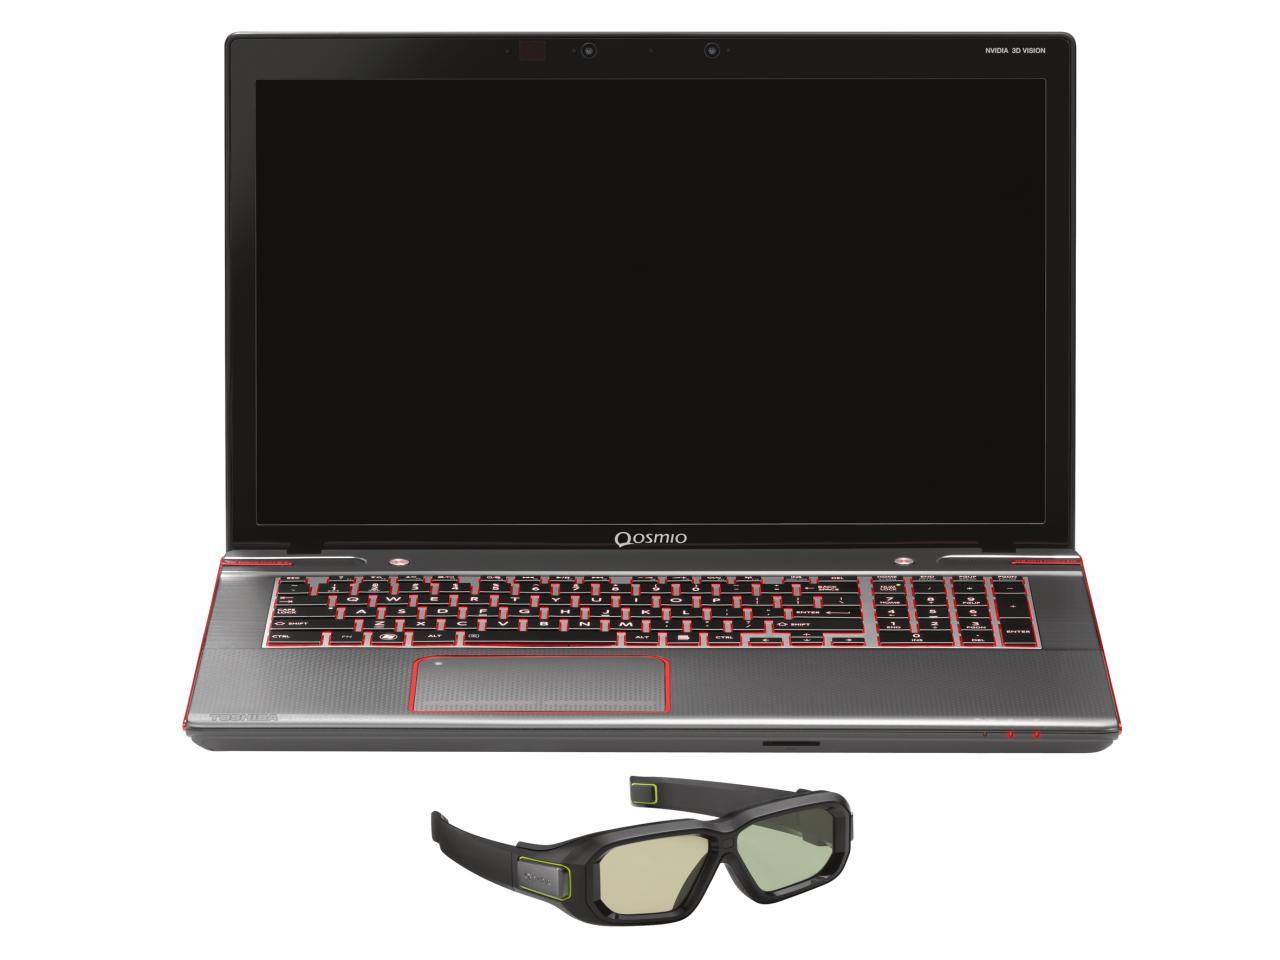 Toshiba Qosmio X870 3D mit 3D-Brille (Foto: Toshiba)